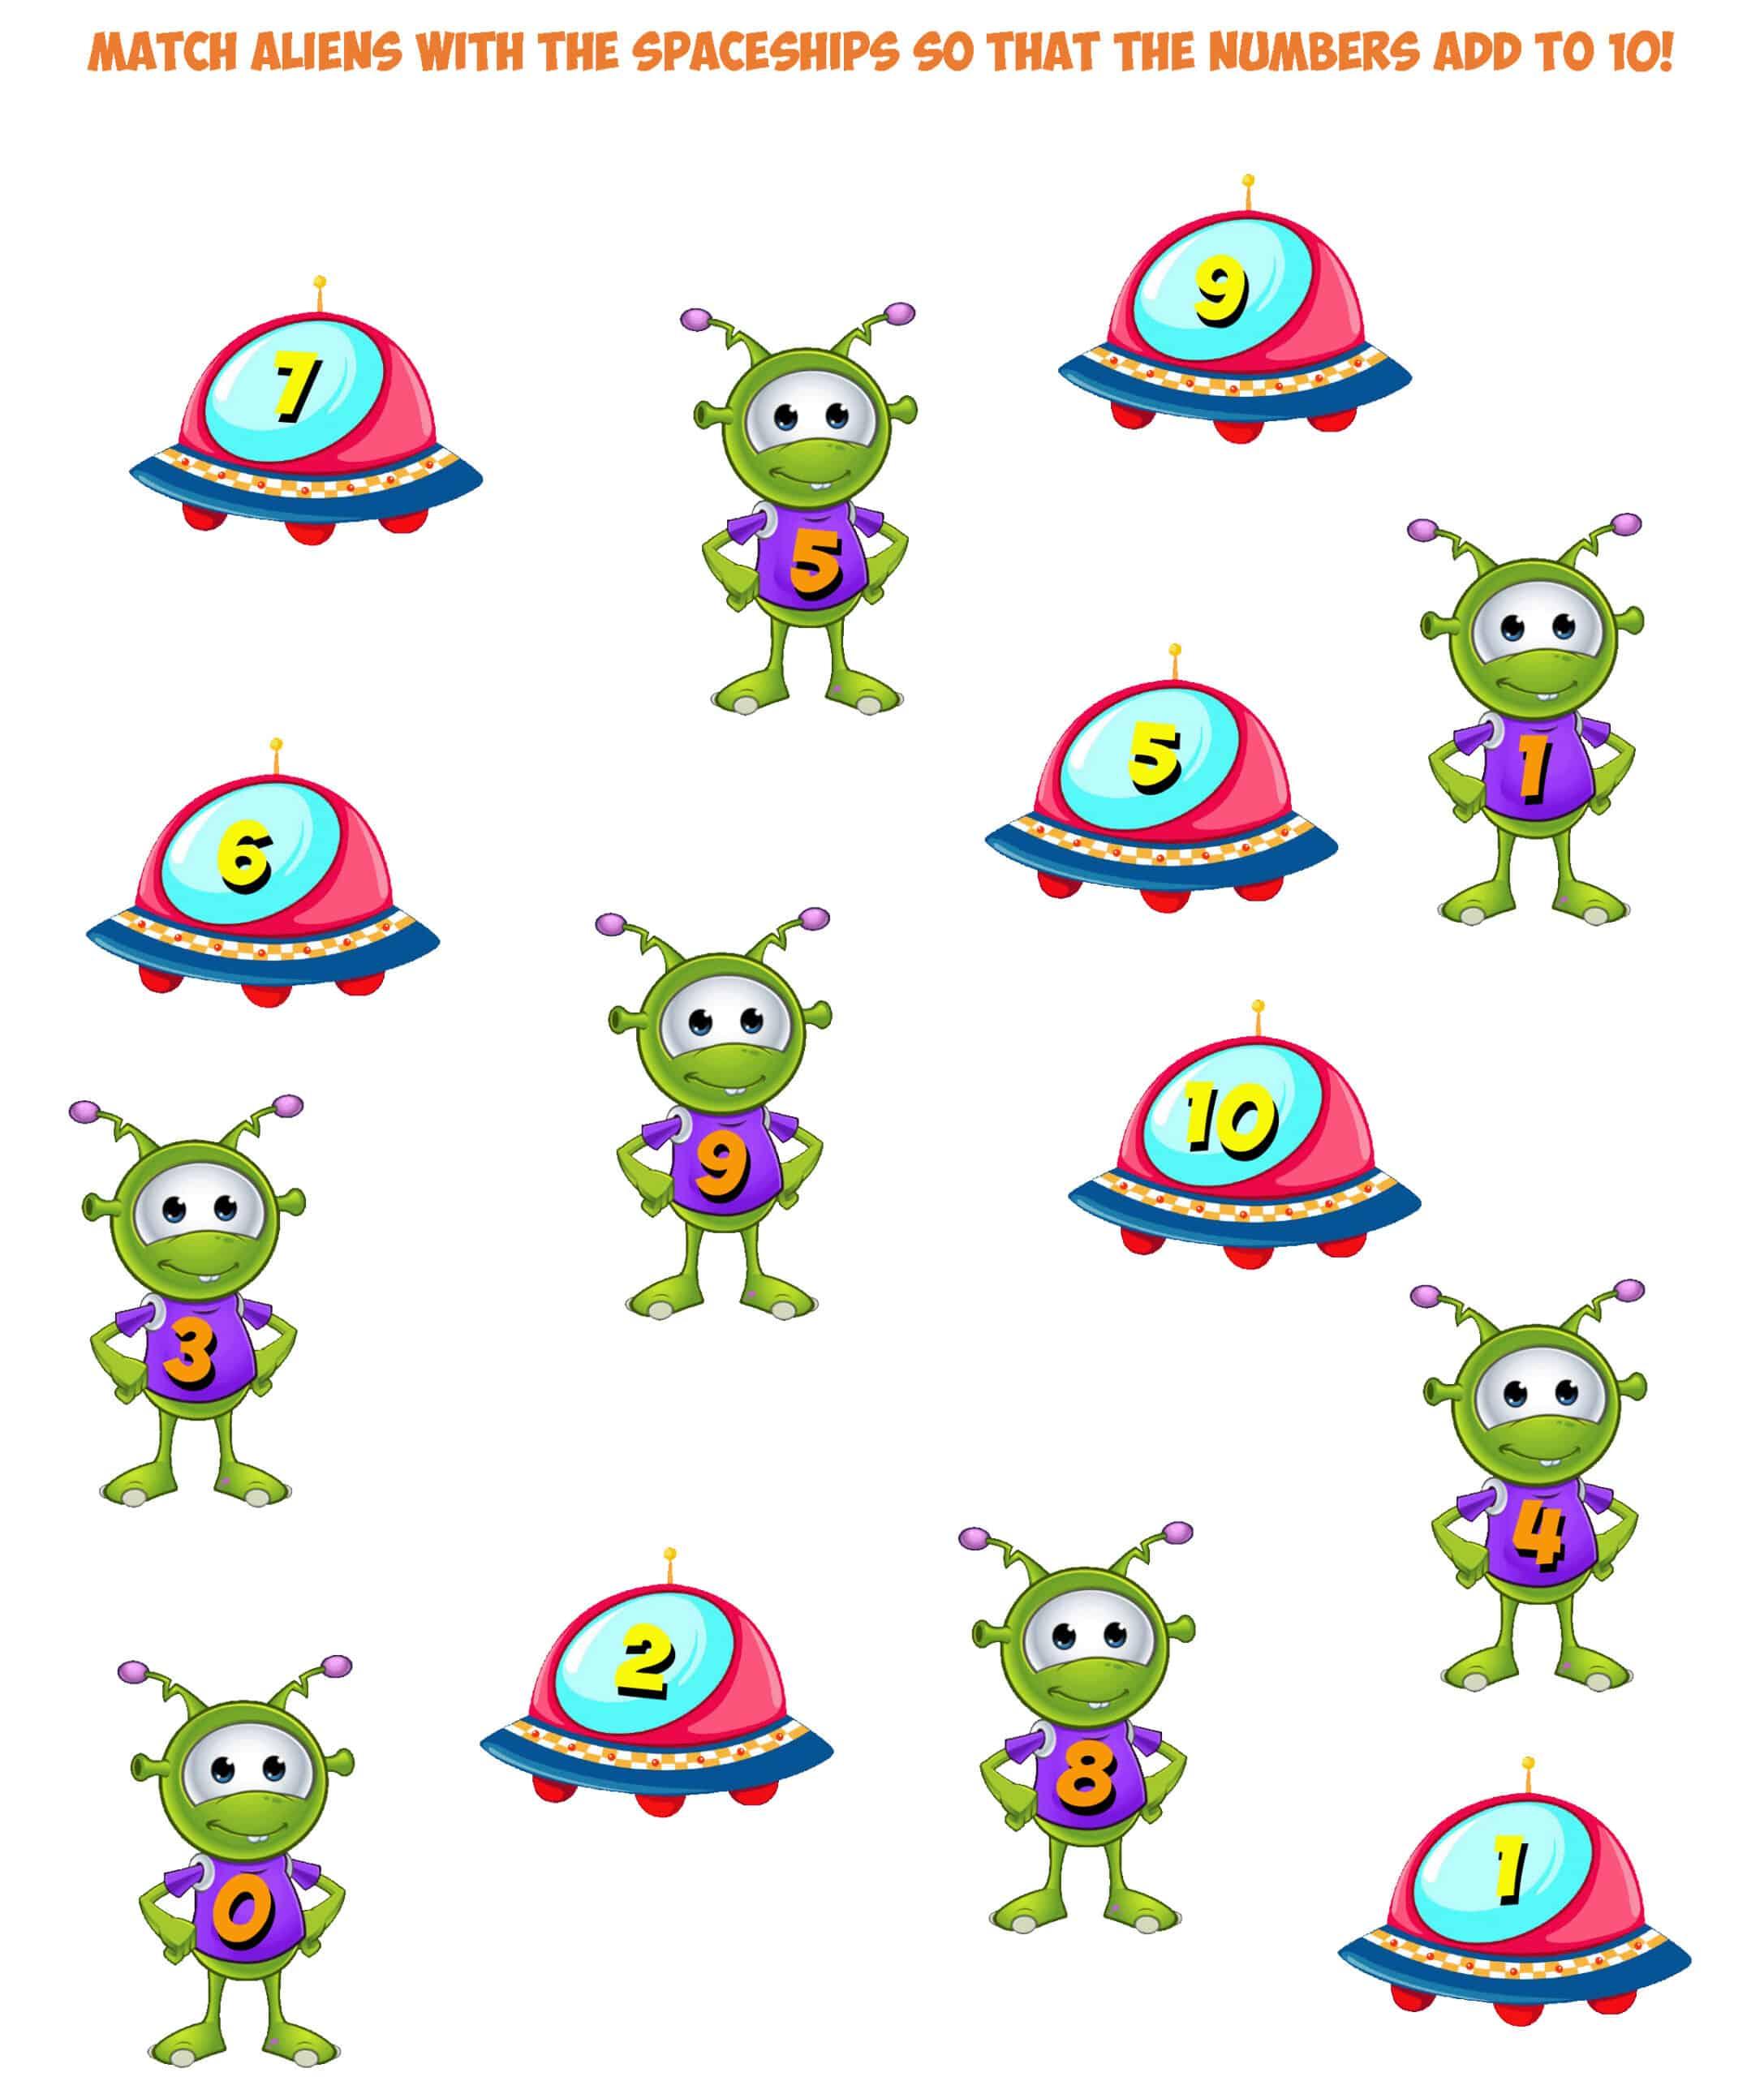 Alien Match Worksheet Add To 10